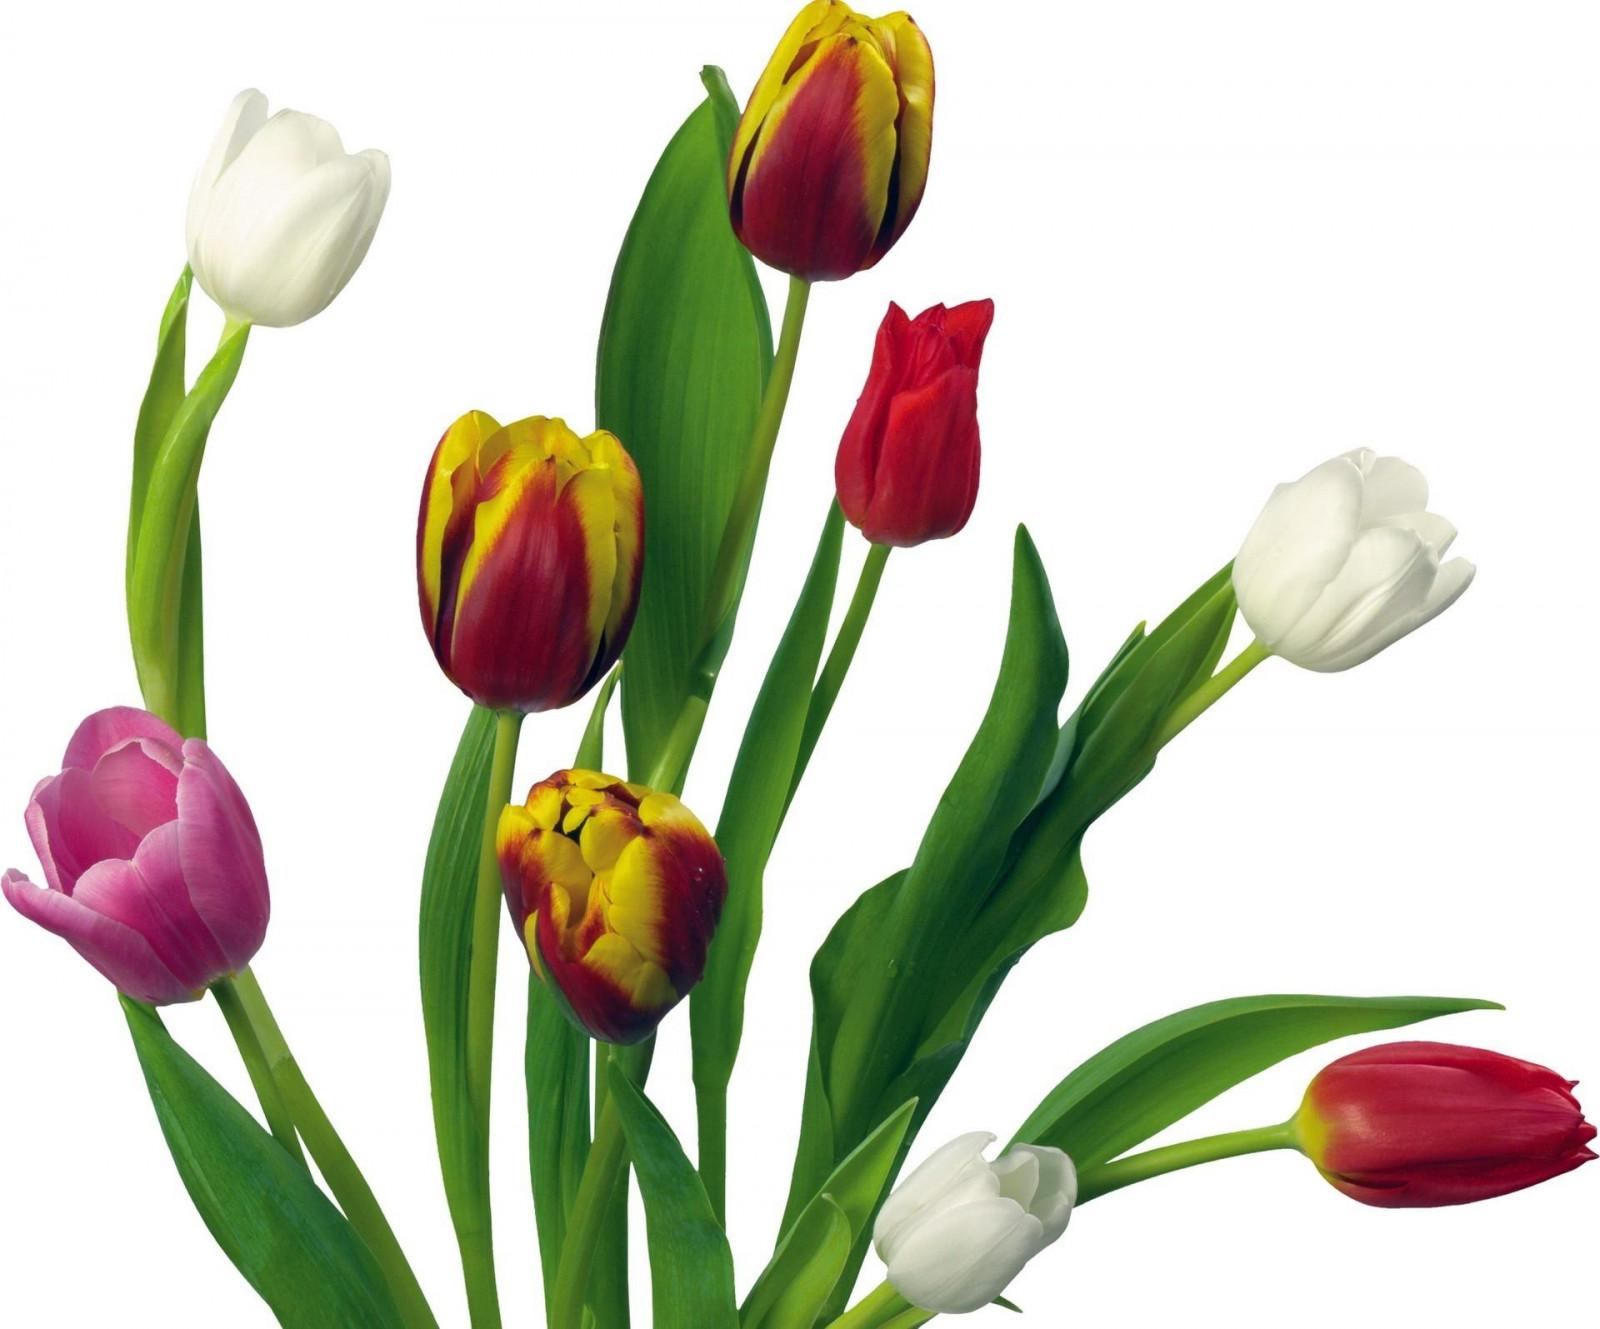 Юбилеем, картинки букет весенних цветов на прозрачном фоне